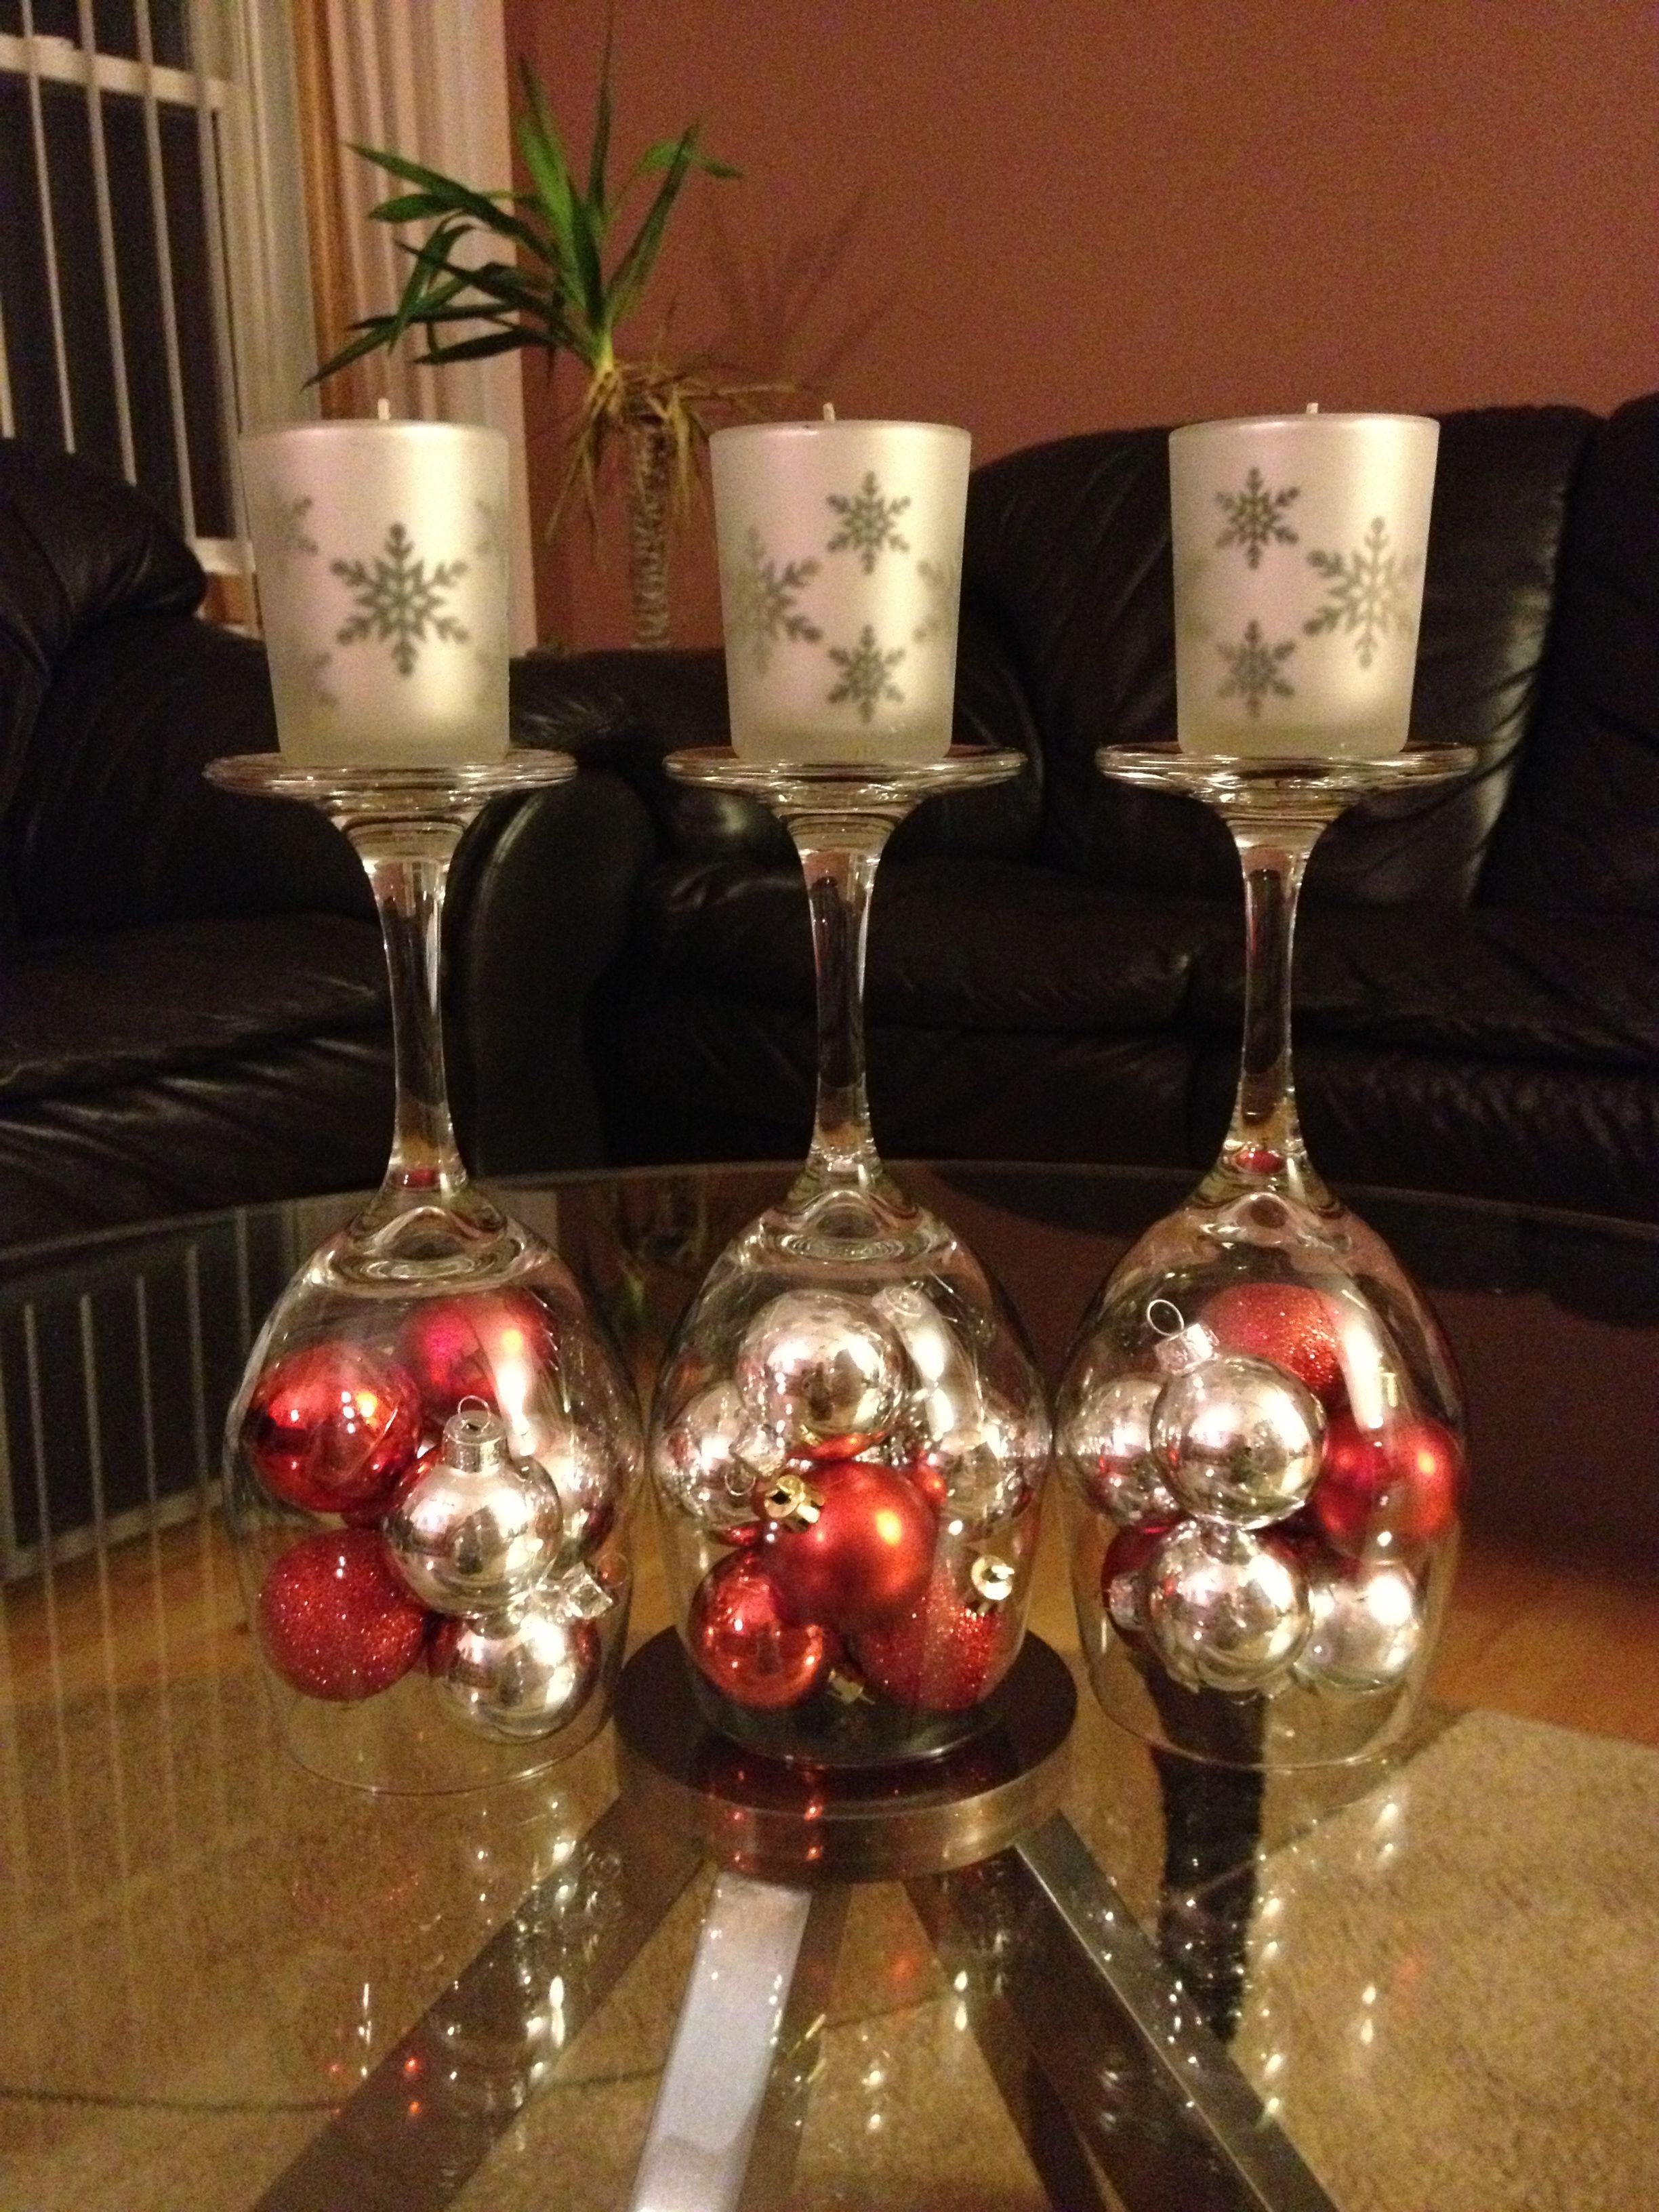 Diy Christmas Decorations Upside Down Wine Glass Dollar Store Mini Orn Diy Christmas Decorations Easy Christmas Centerpieces Diy Glass Christmas Decorations